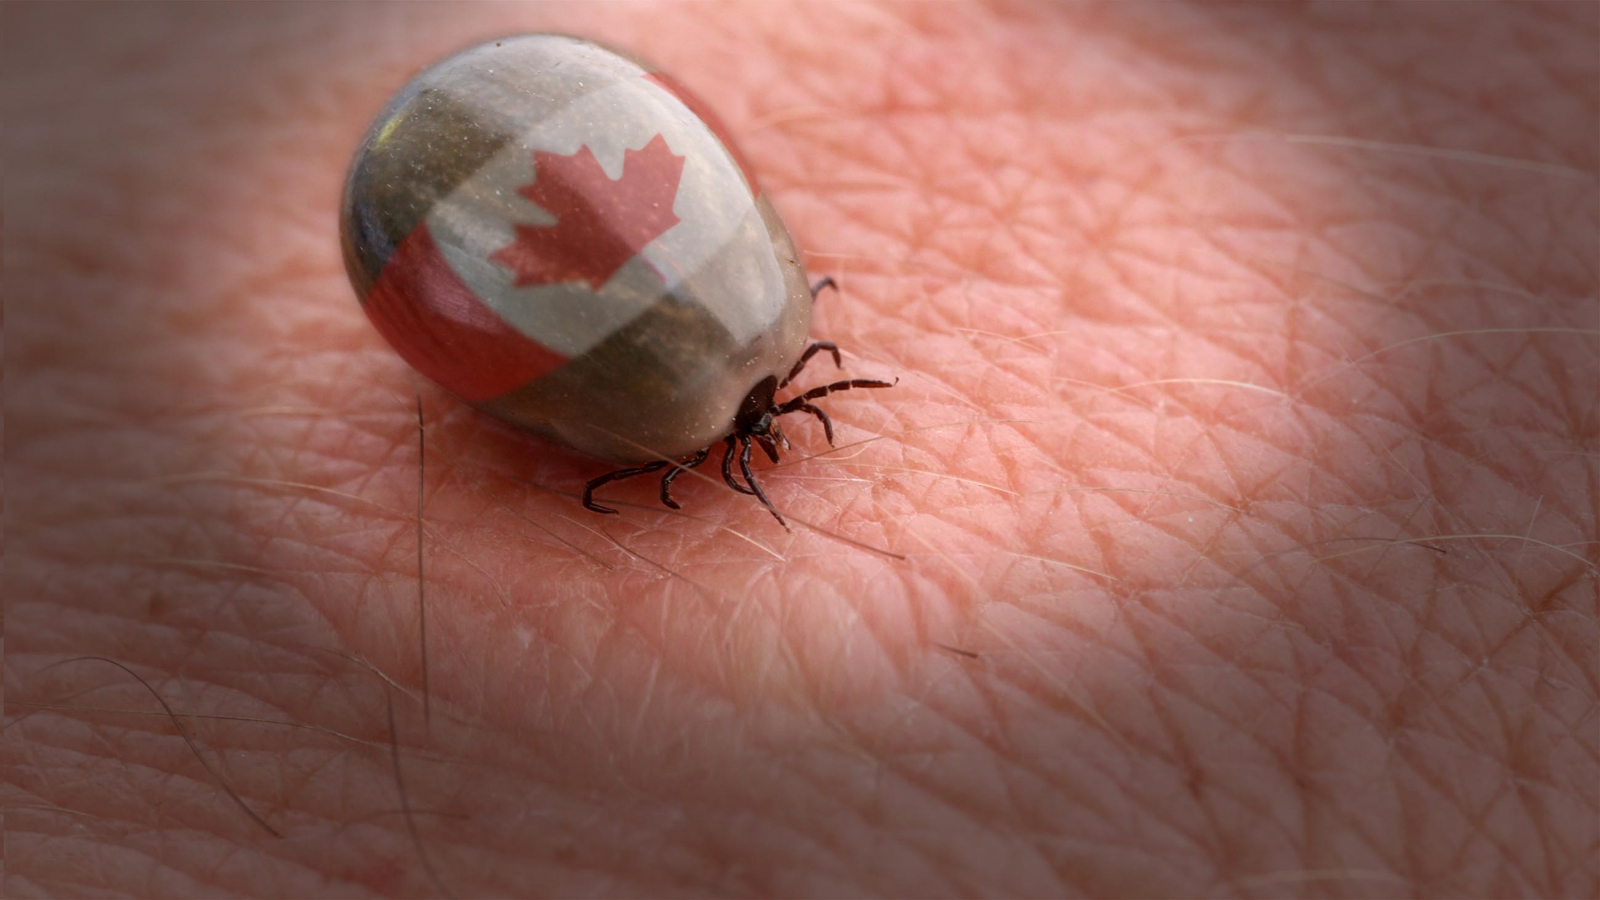 Ticks creep Into Canada, bringing lyme disease (and